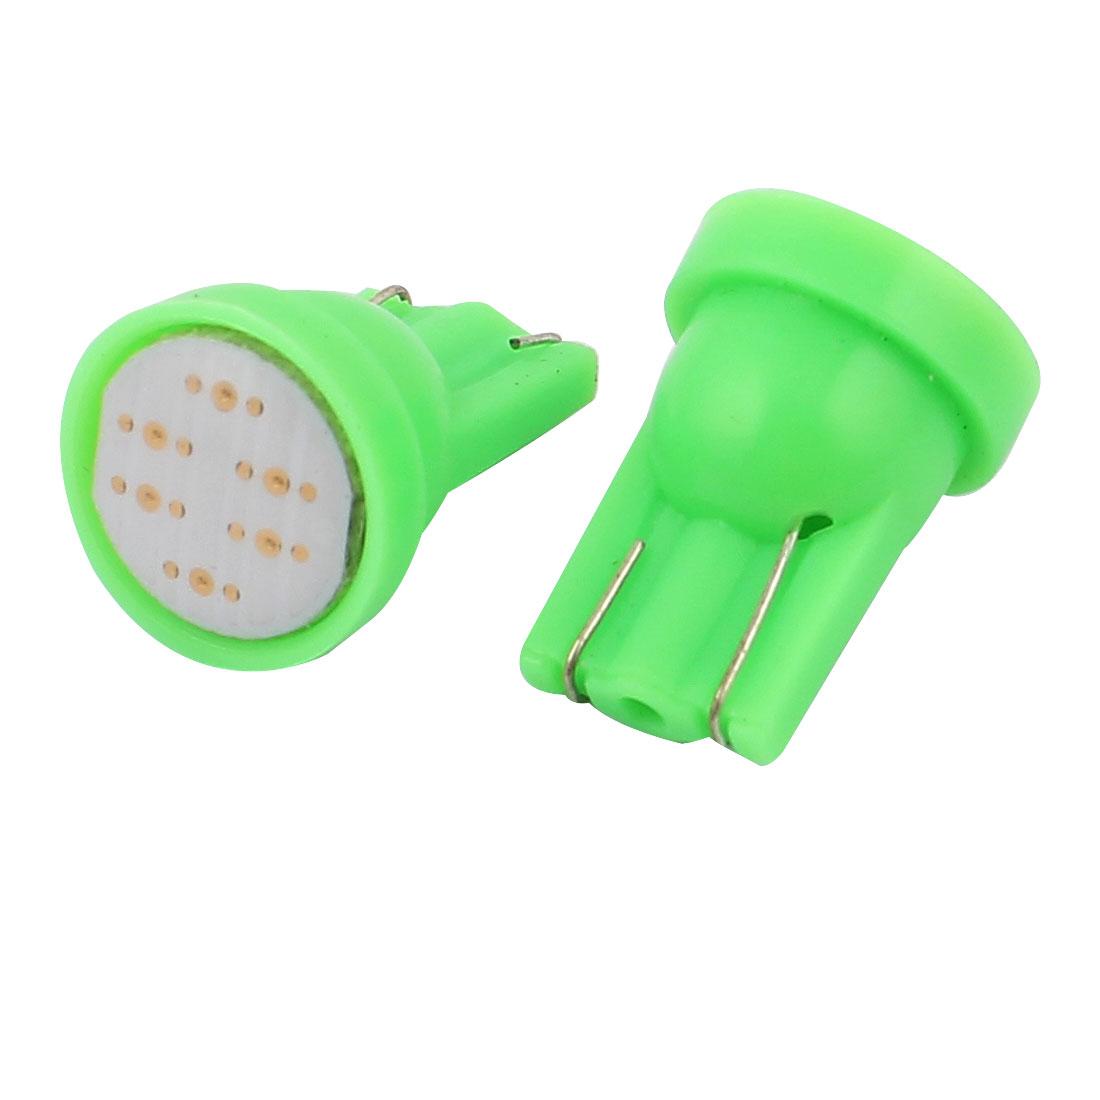 Green LED Car Dashboard Instrument Light Lamp Bulb Interior T10 12V 2Pcs